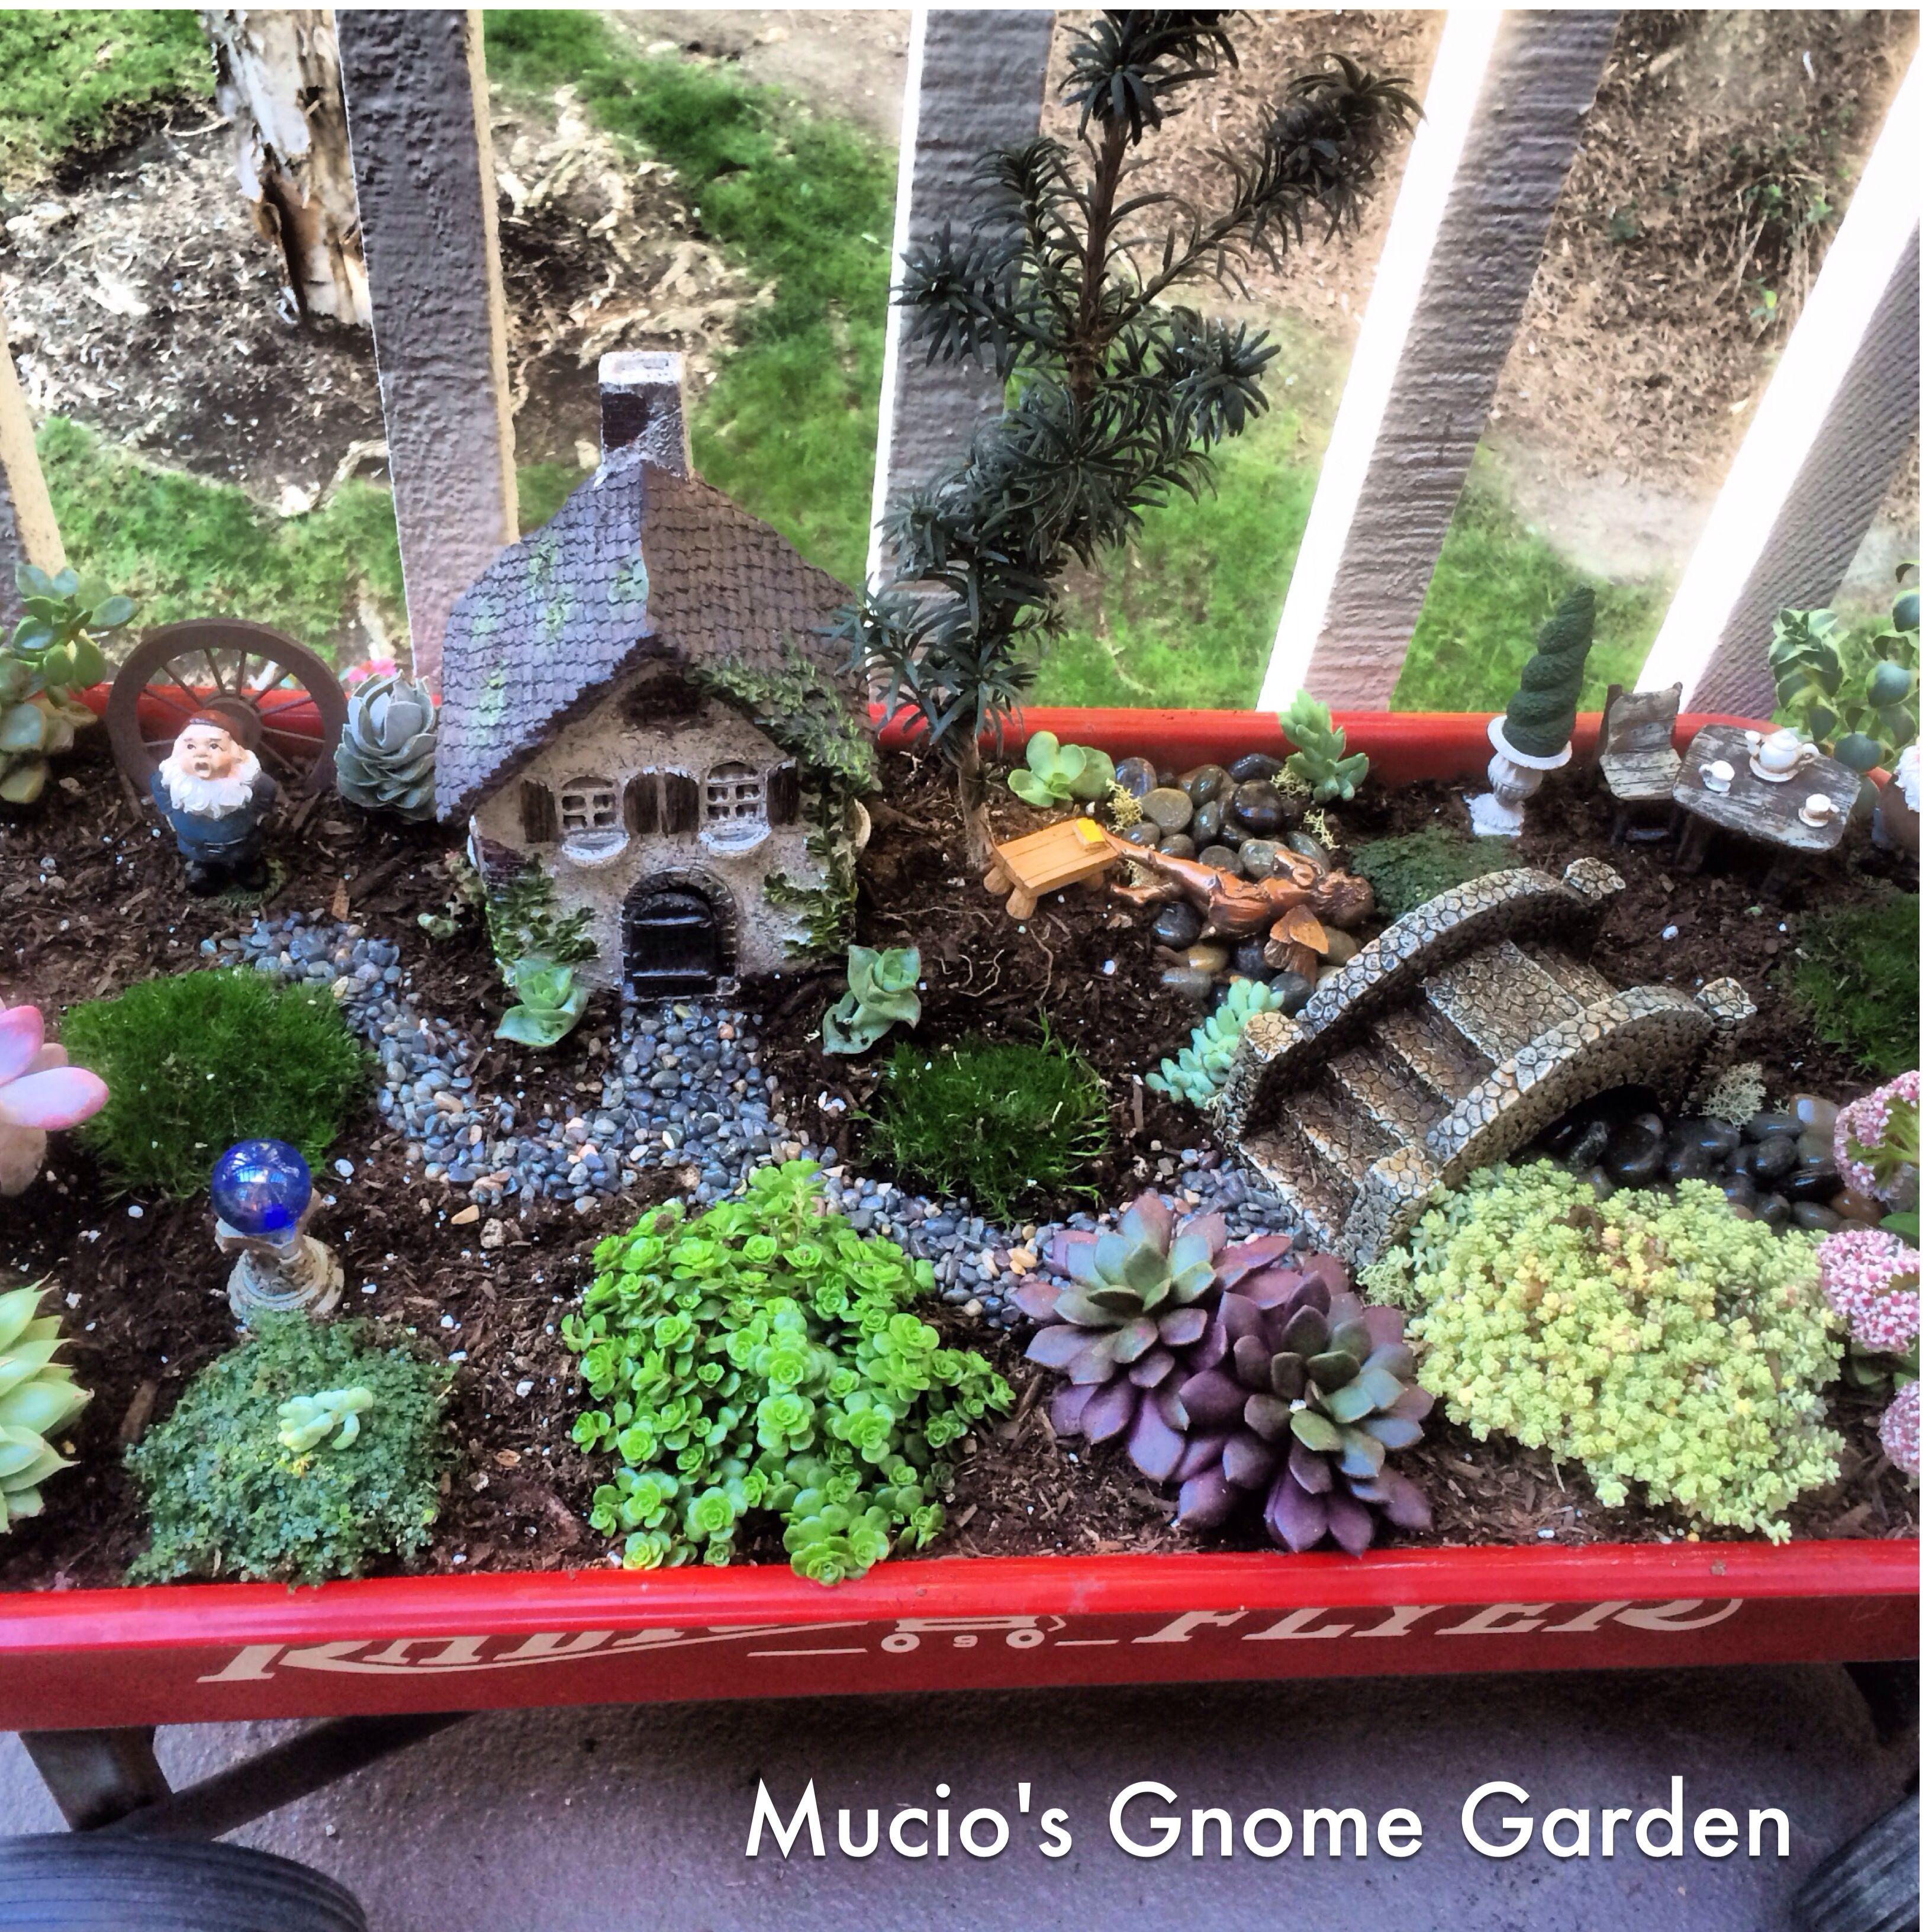 Sophisticated My Fairy Garden Gnome Garden My Fairy Garden Gnome Garden Fairy Gardens Pinterest Gnome Miniature Gnome Garden Ideas garden Miniature Gnome Garden Ideas